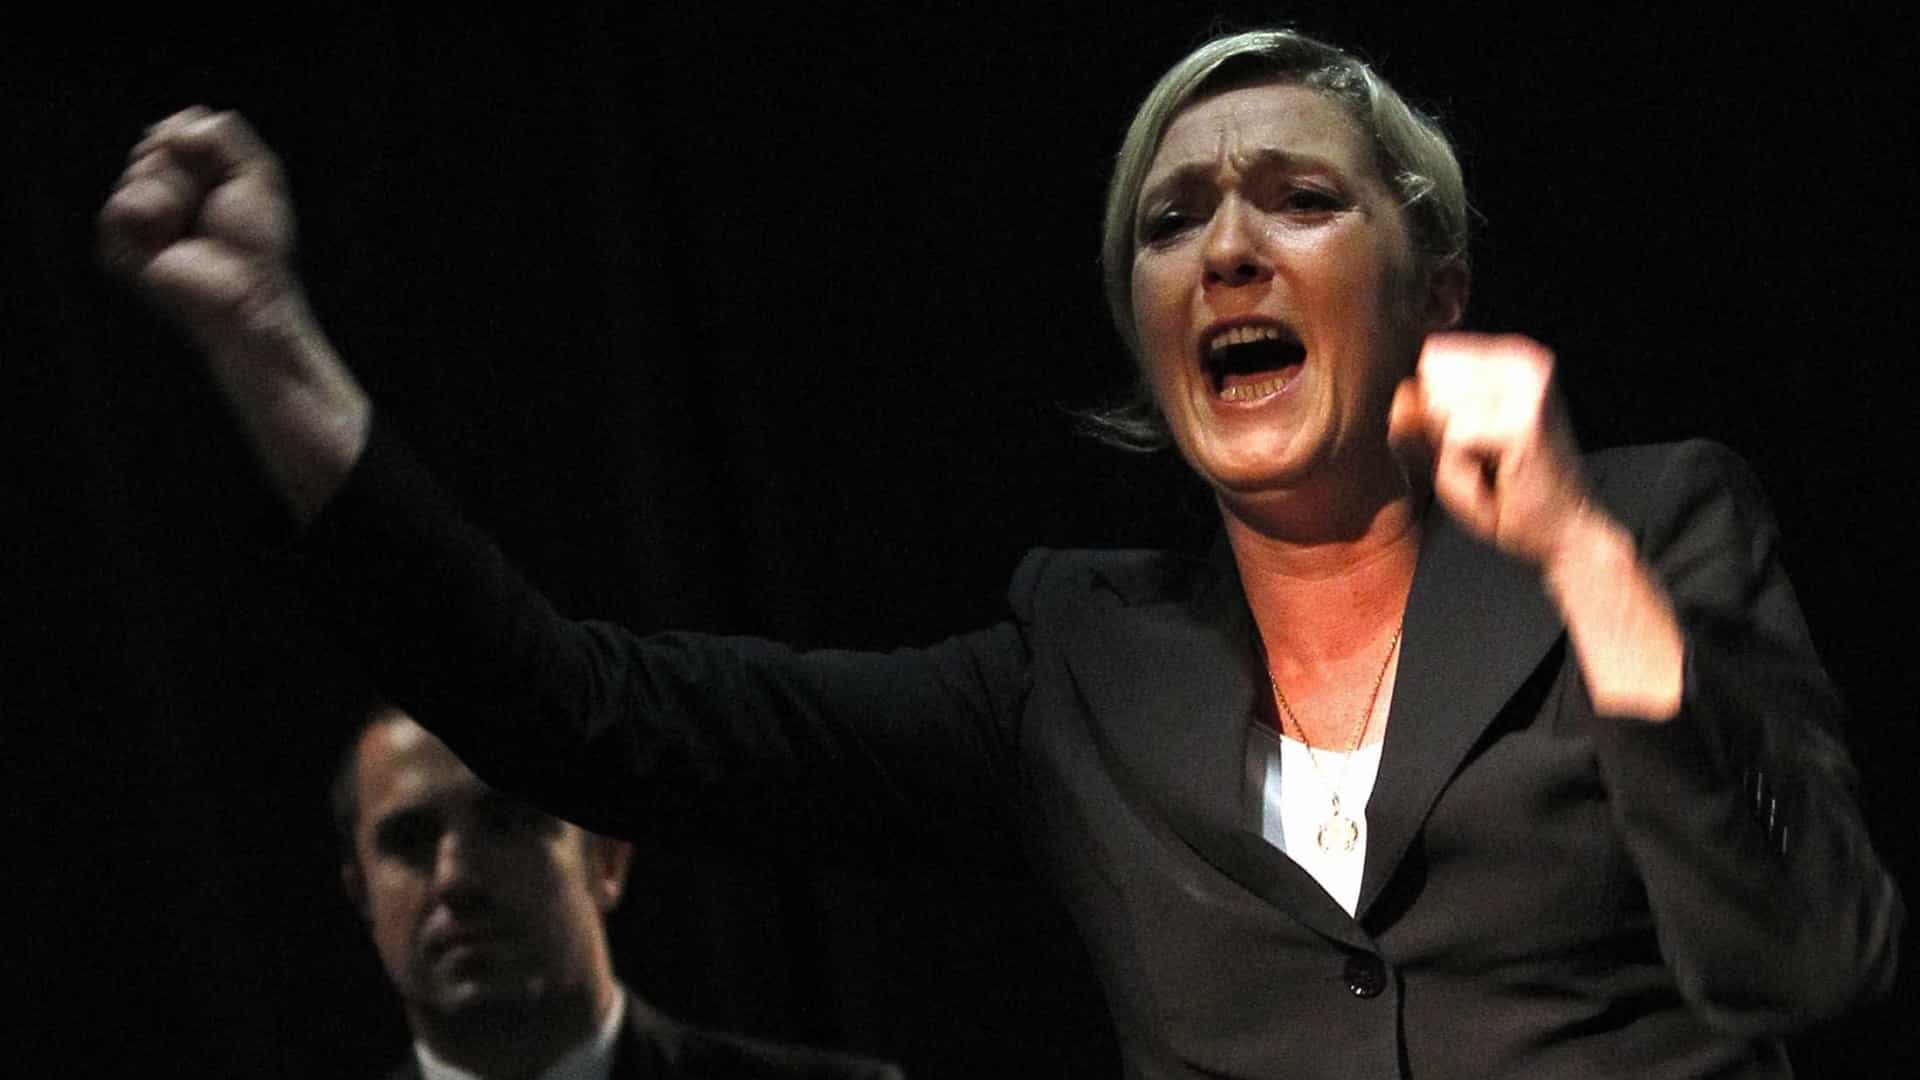 Marine Le Pen eleita deputada pela primeira vez